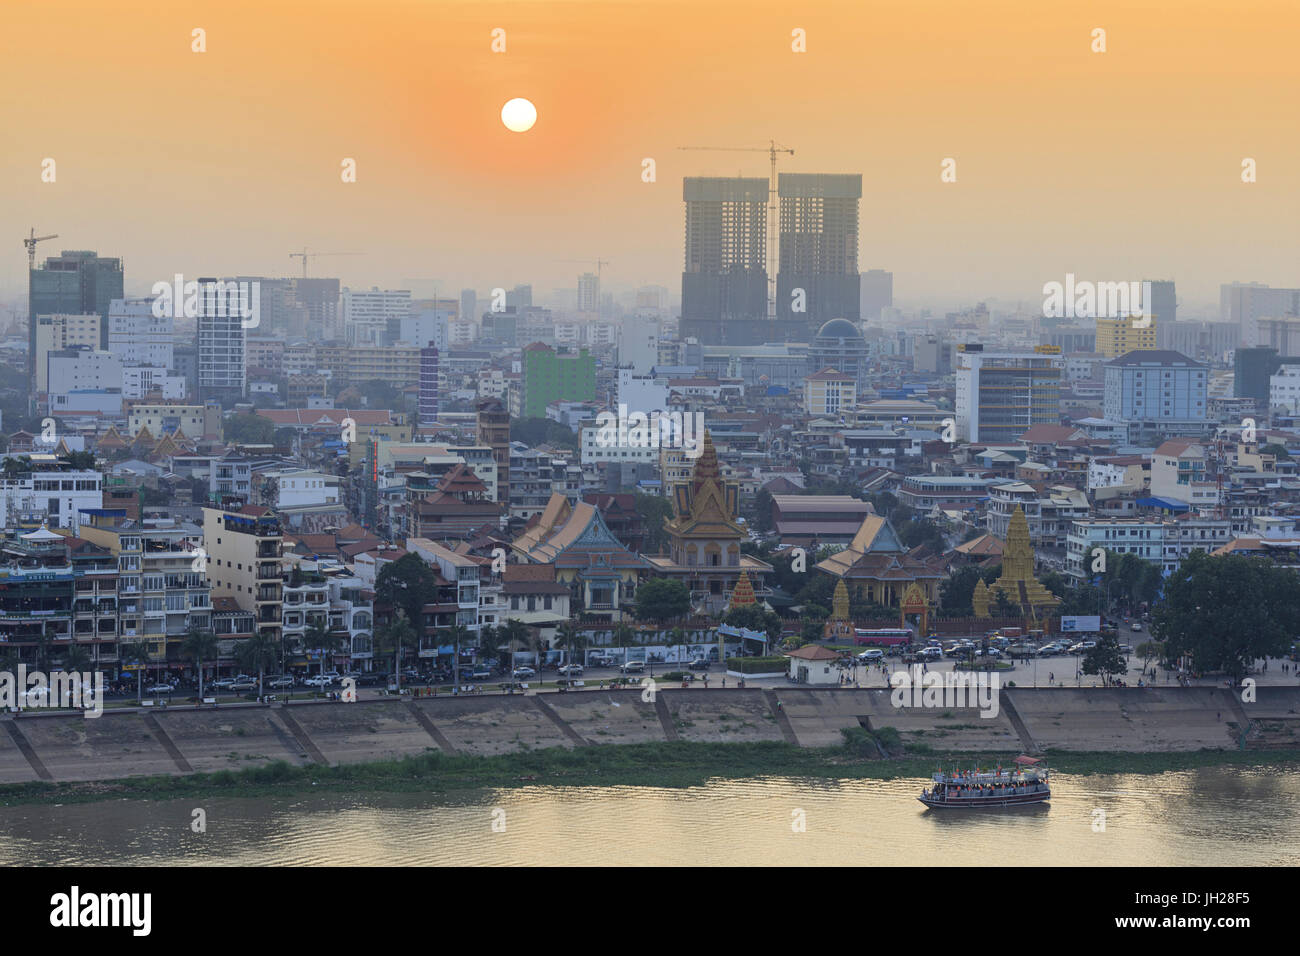 Phnom Penh, Cambodia, Indochina, Southeast Asia, Asia - Stock Image